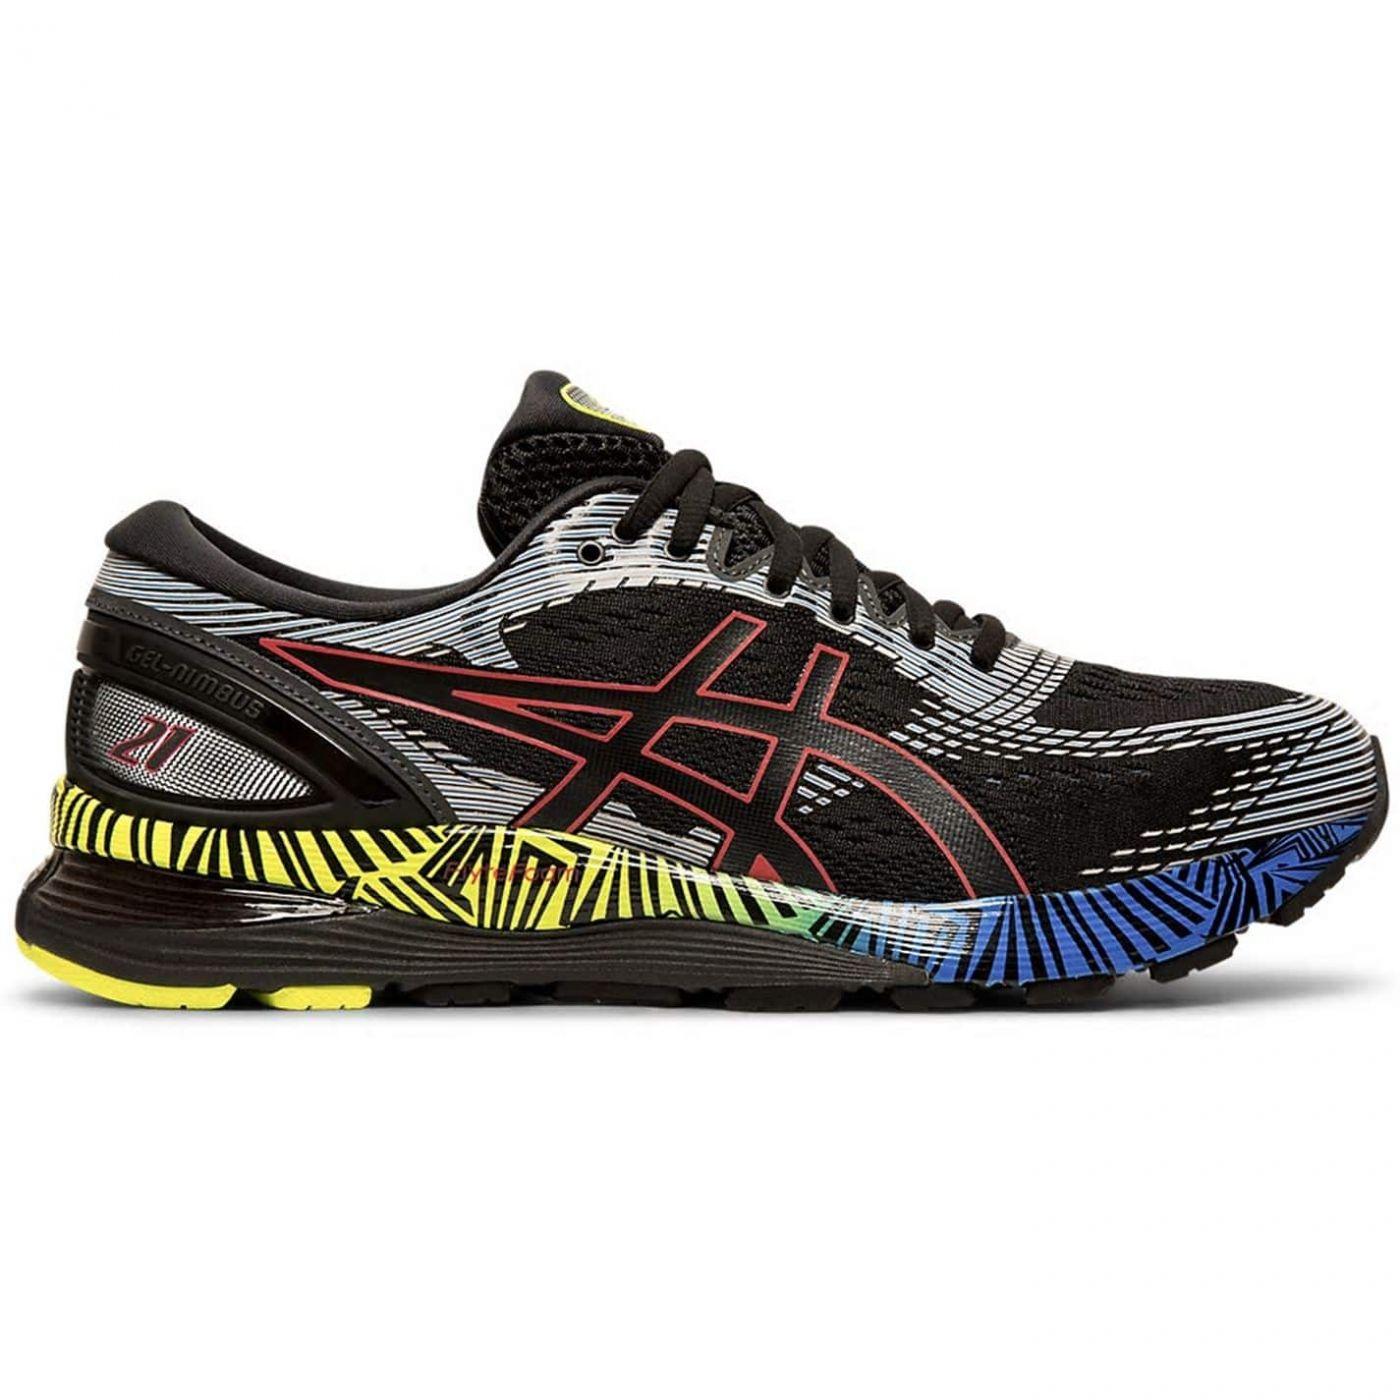 Asics GEL-Nimbus 21 LS Mens Running Shoes